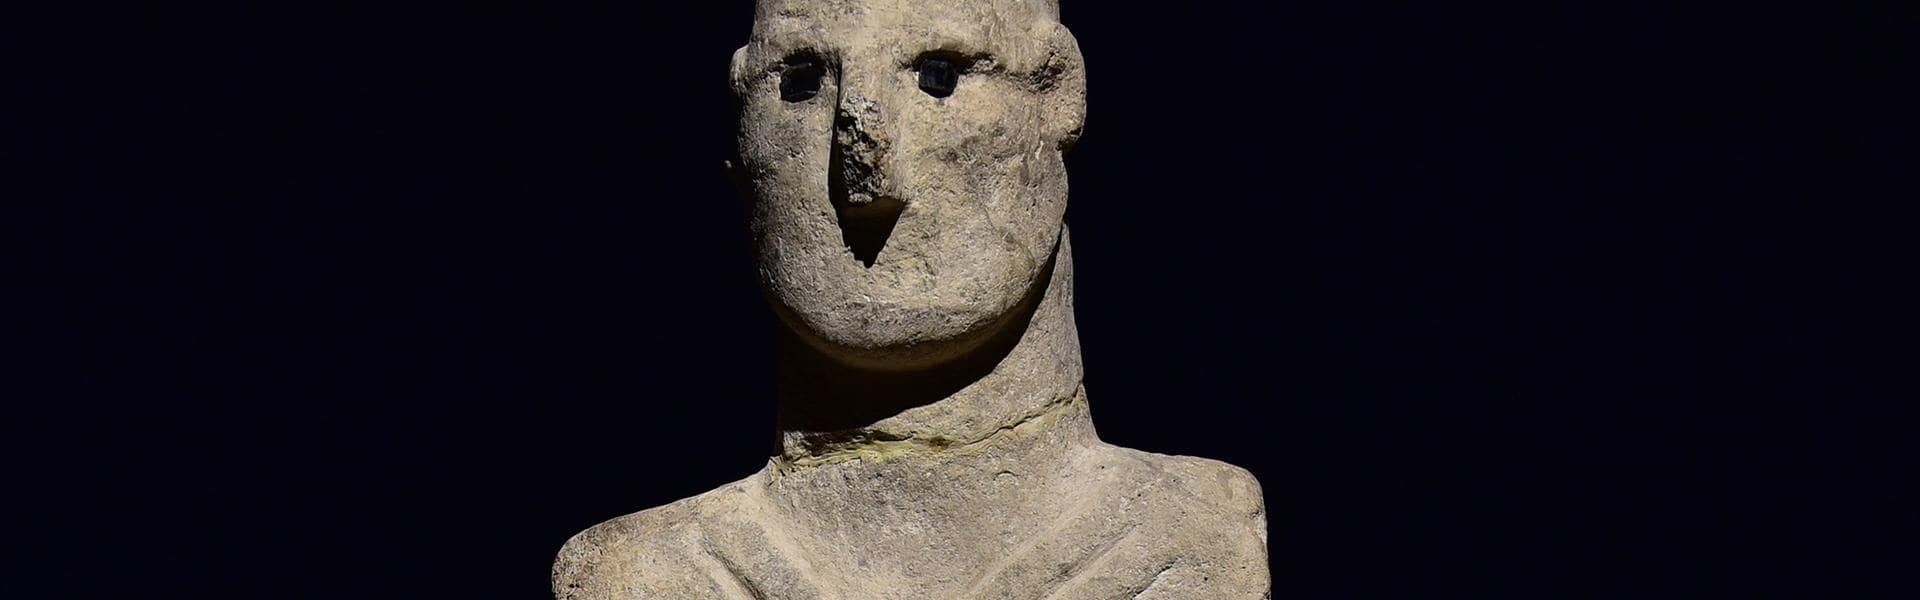 balikligol-statue-hero-image